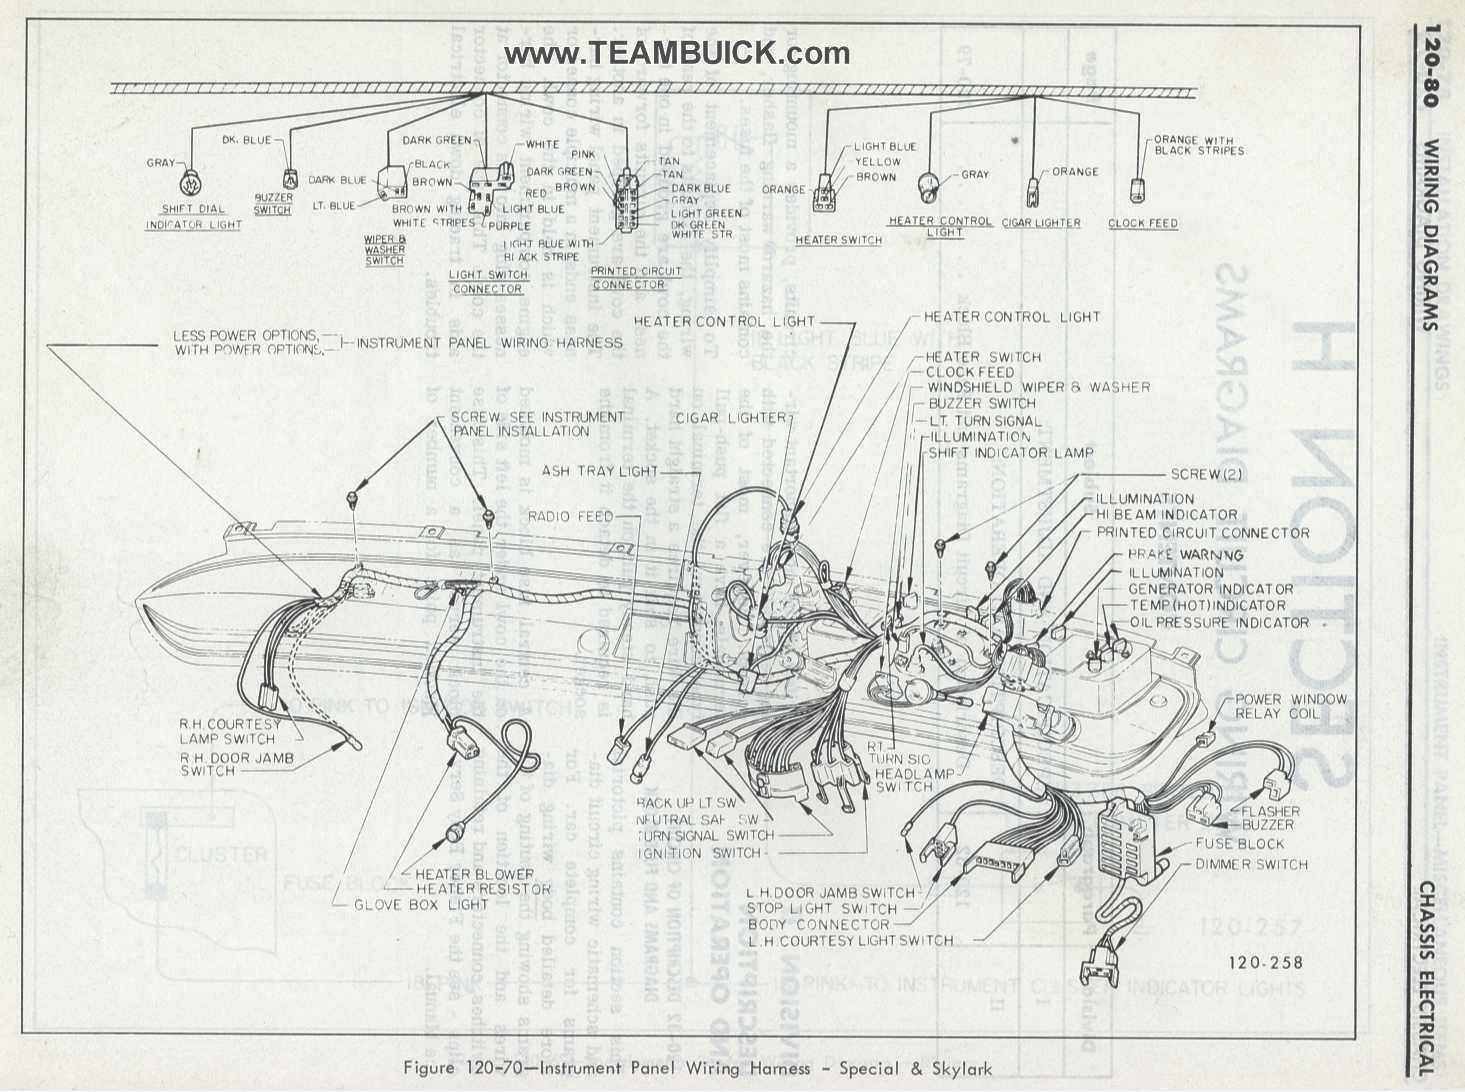 1967 buick riviera fuse block